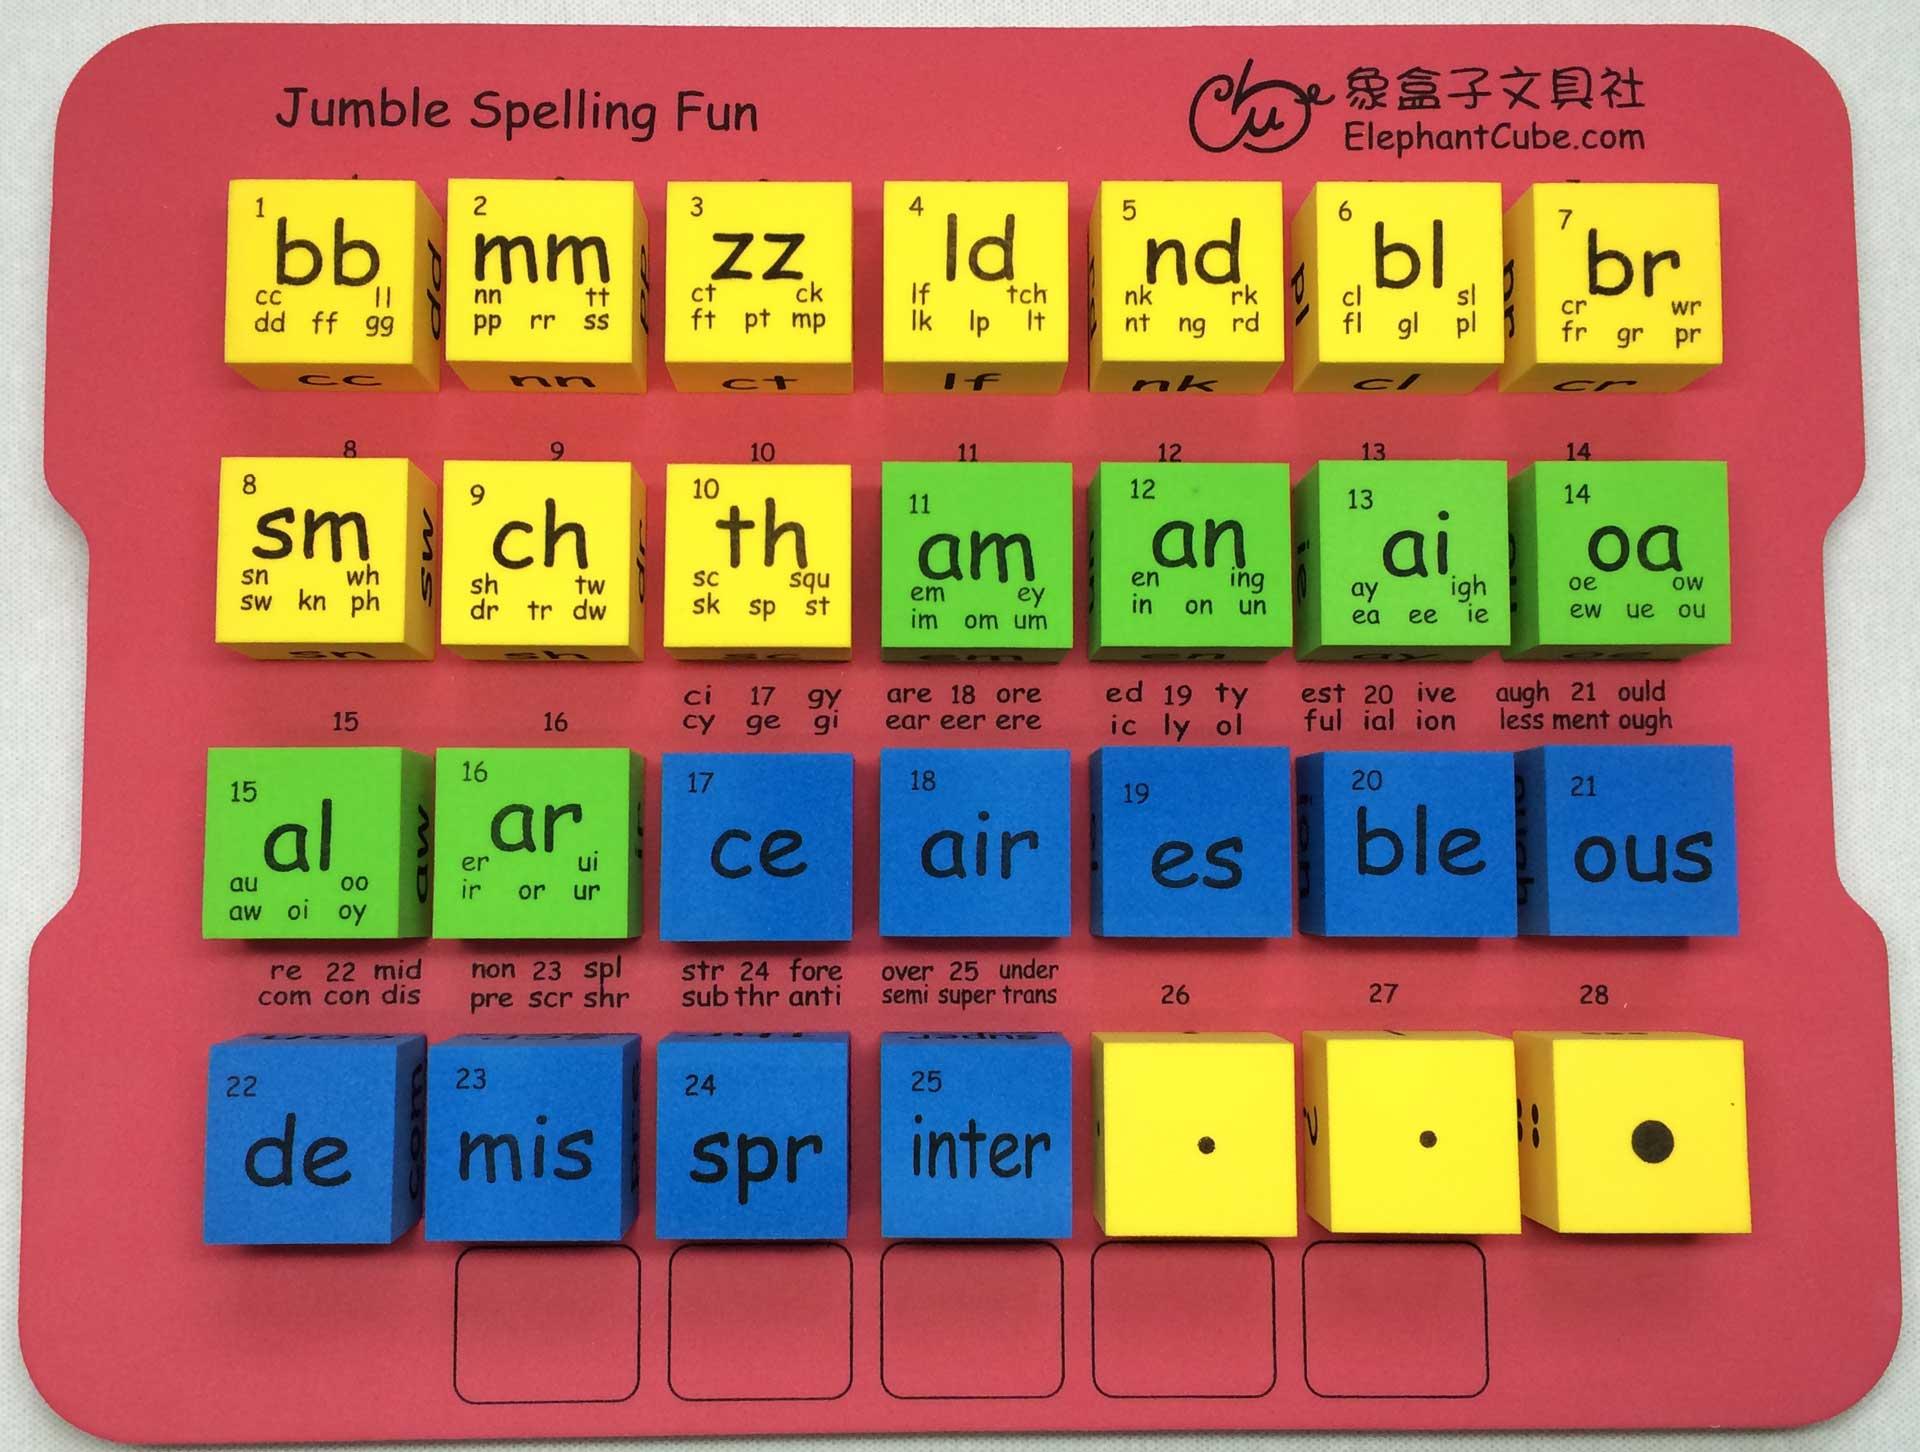 麻辣拼盛 Jumble Spelling